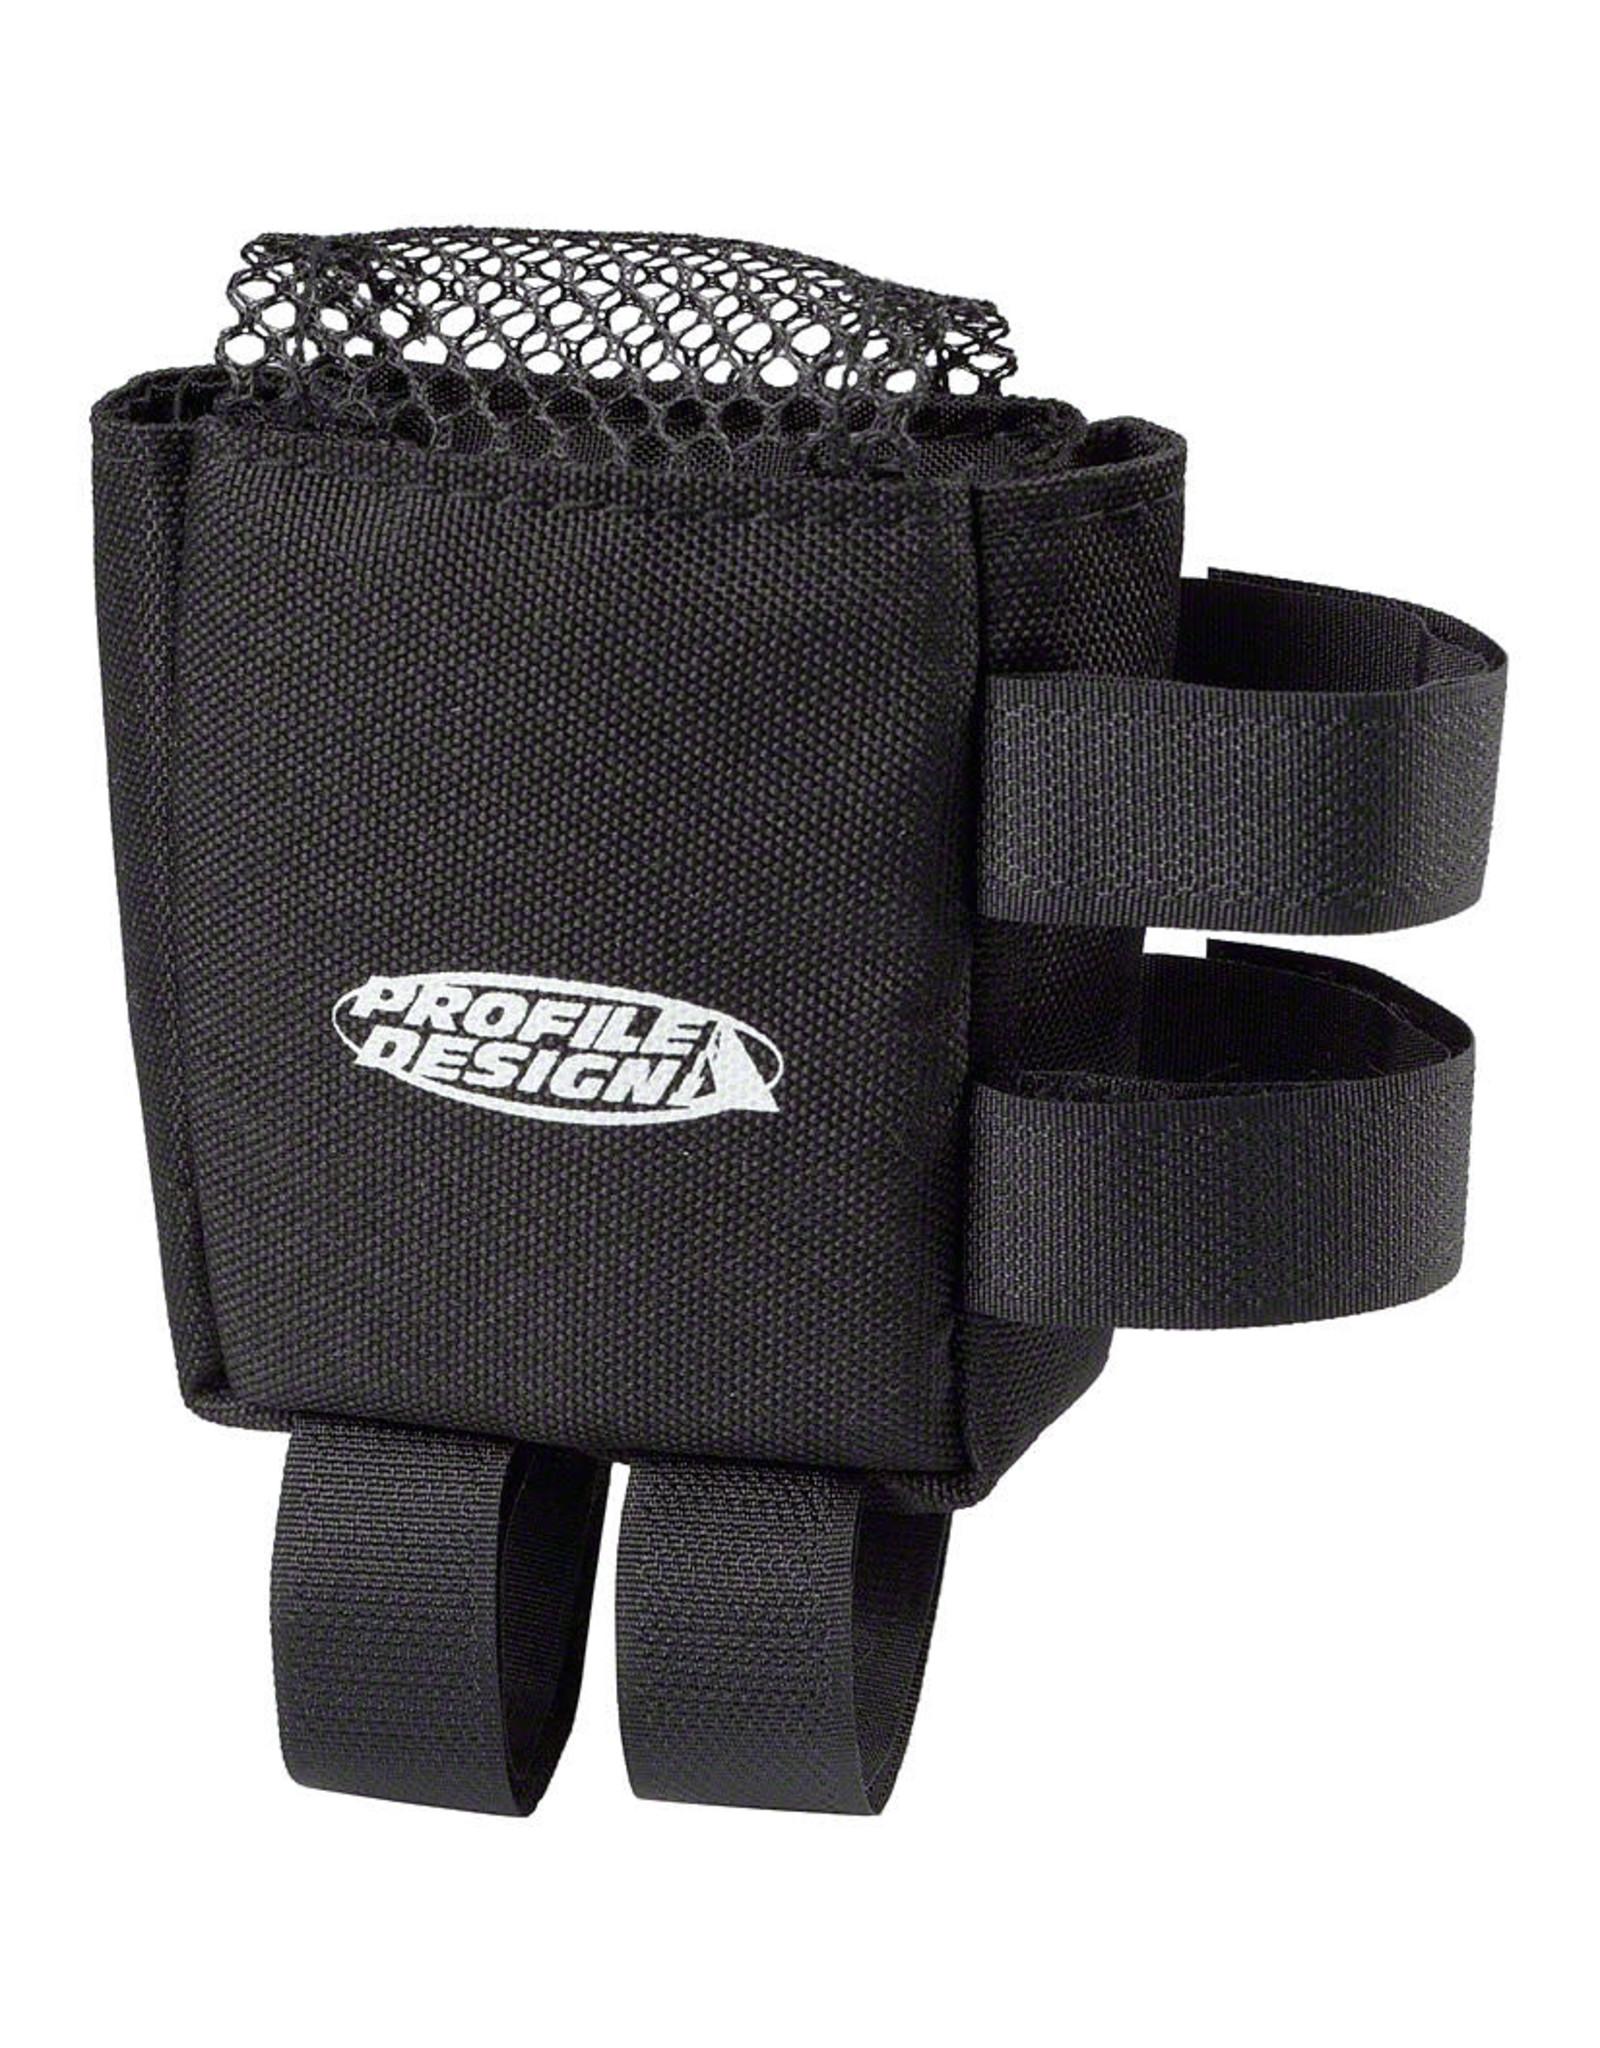 Profile Design Profile Design E-Pack Top Tube Stem Bag Black SM